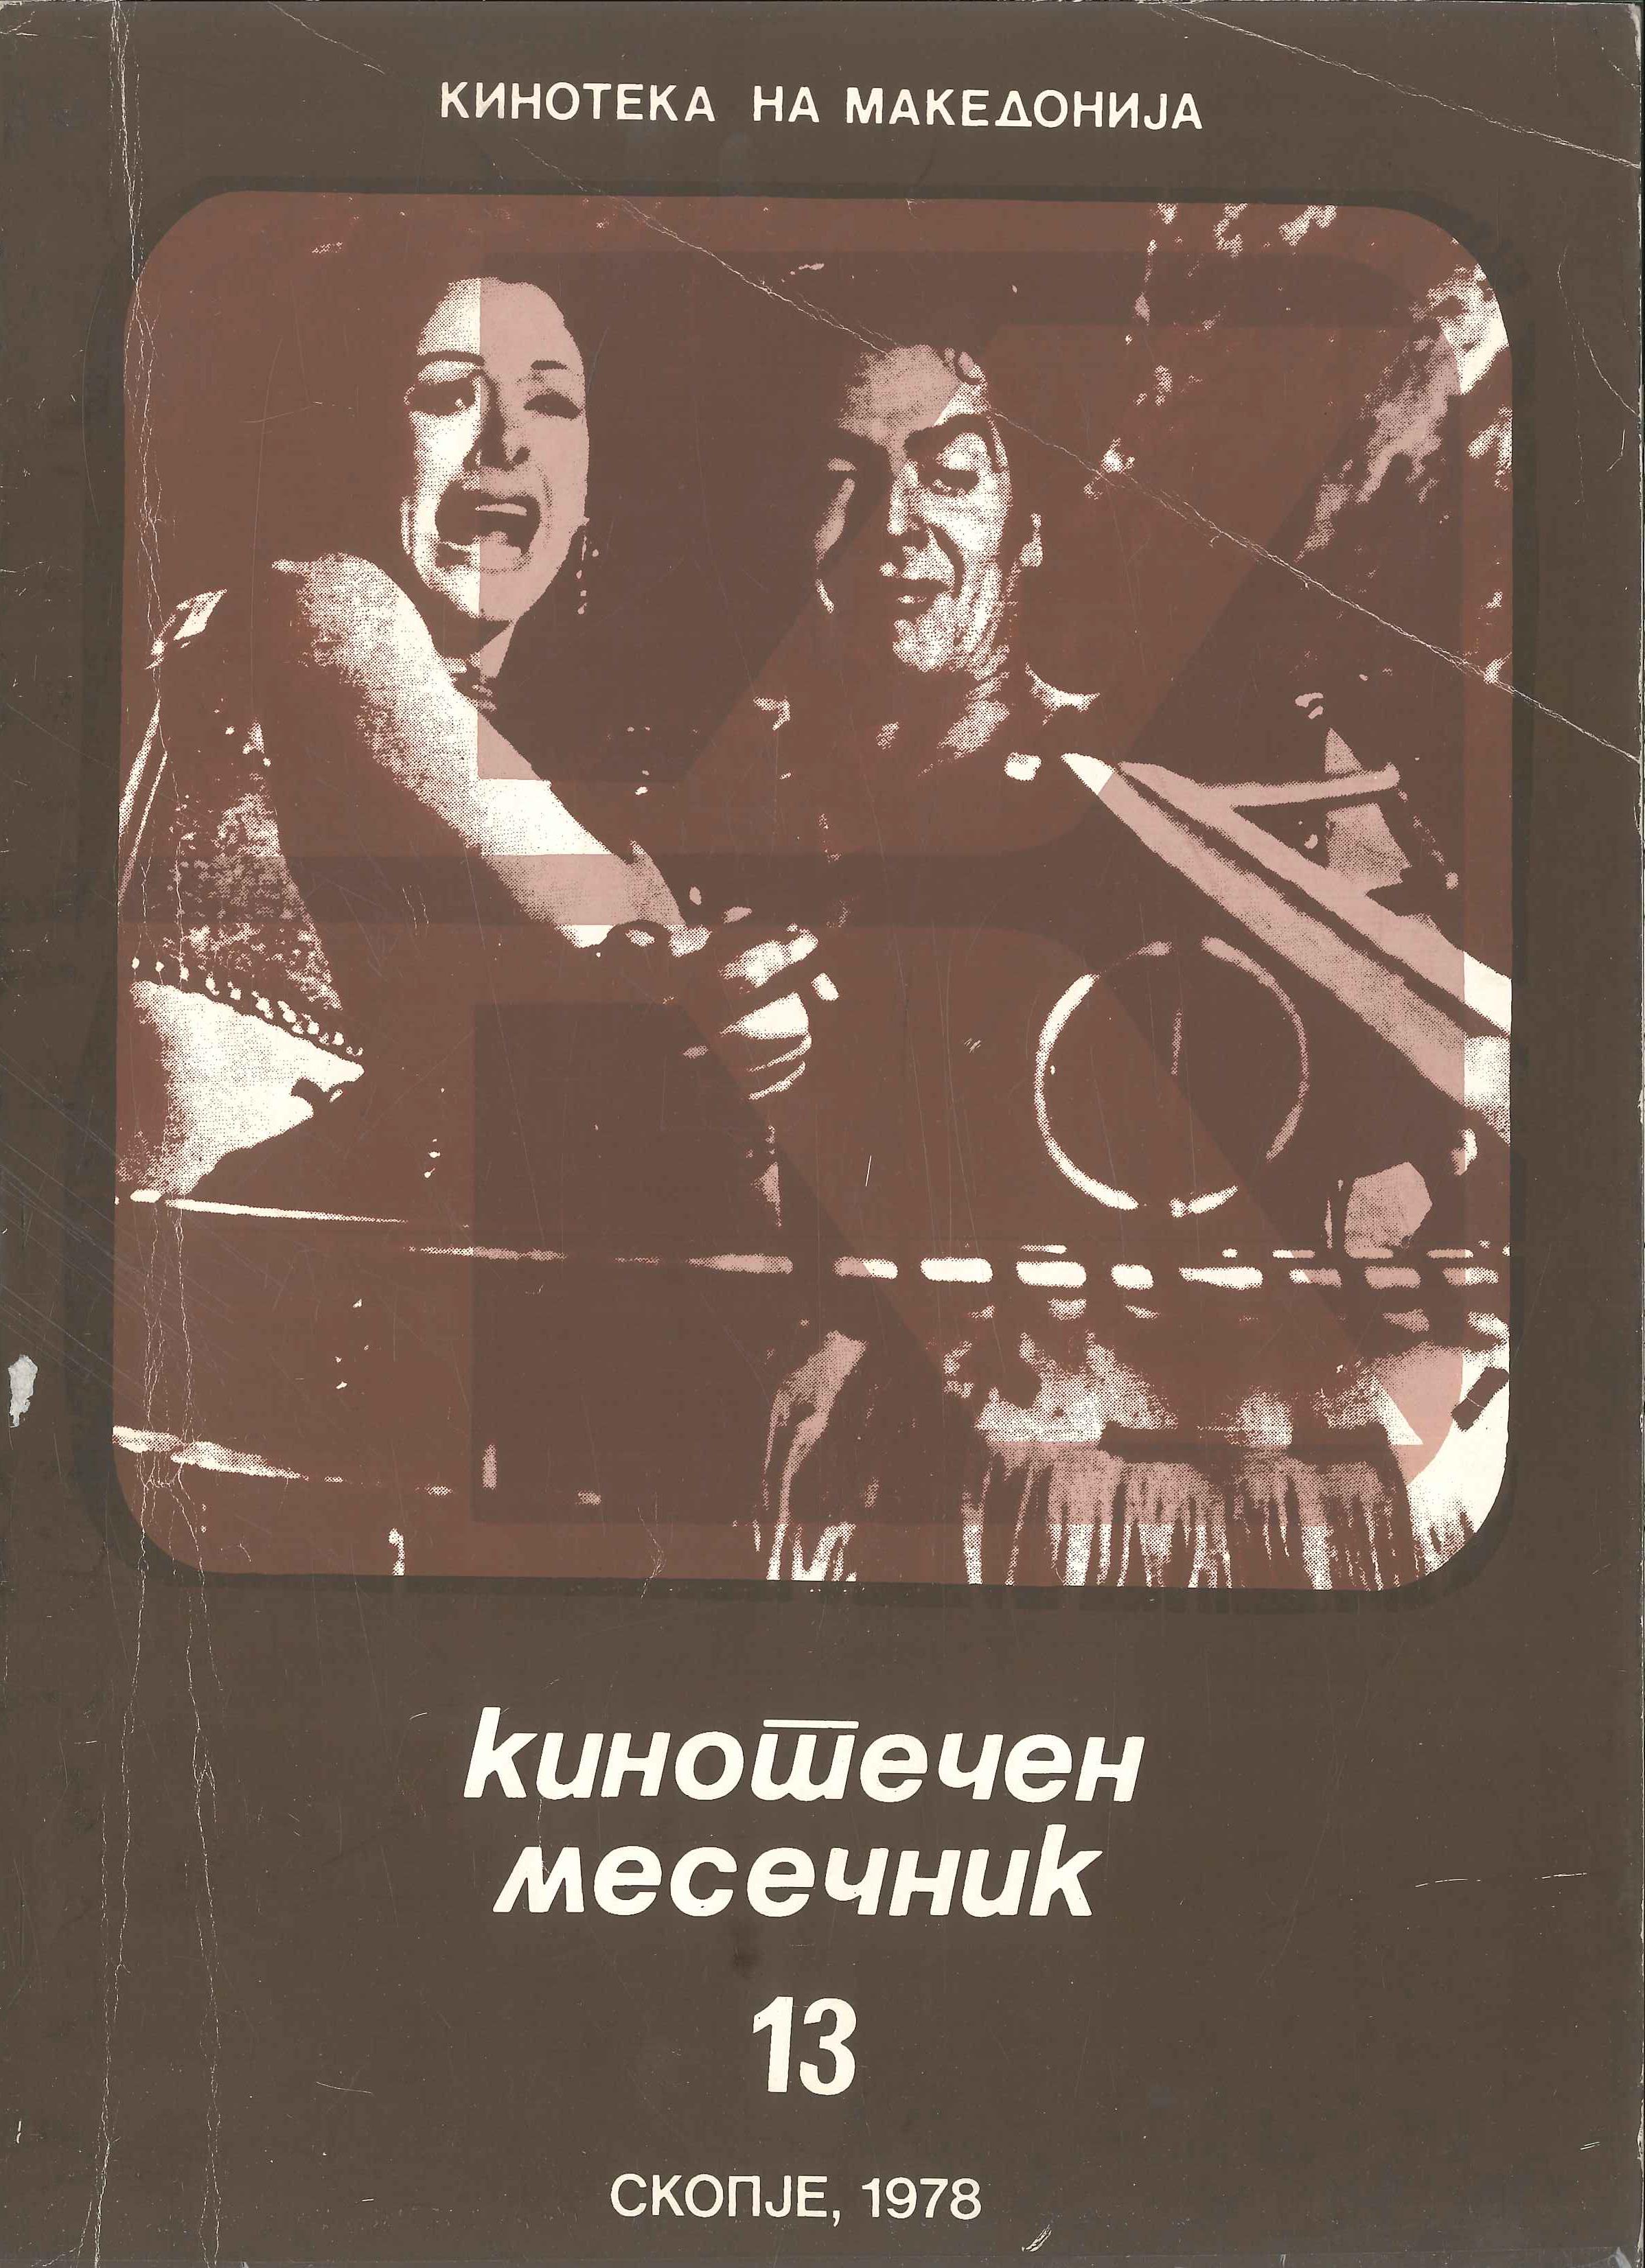 Кинотечен месечник бр. 13